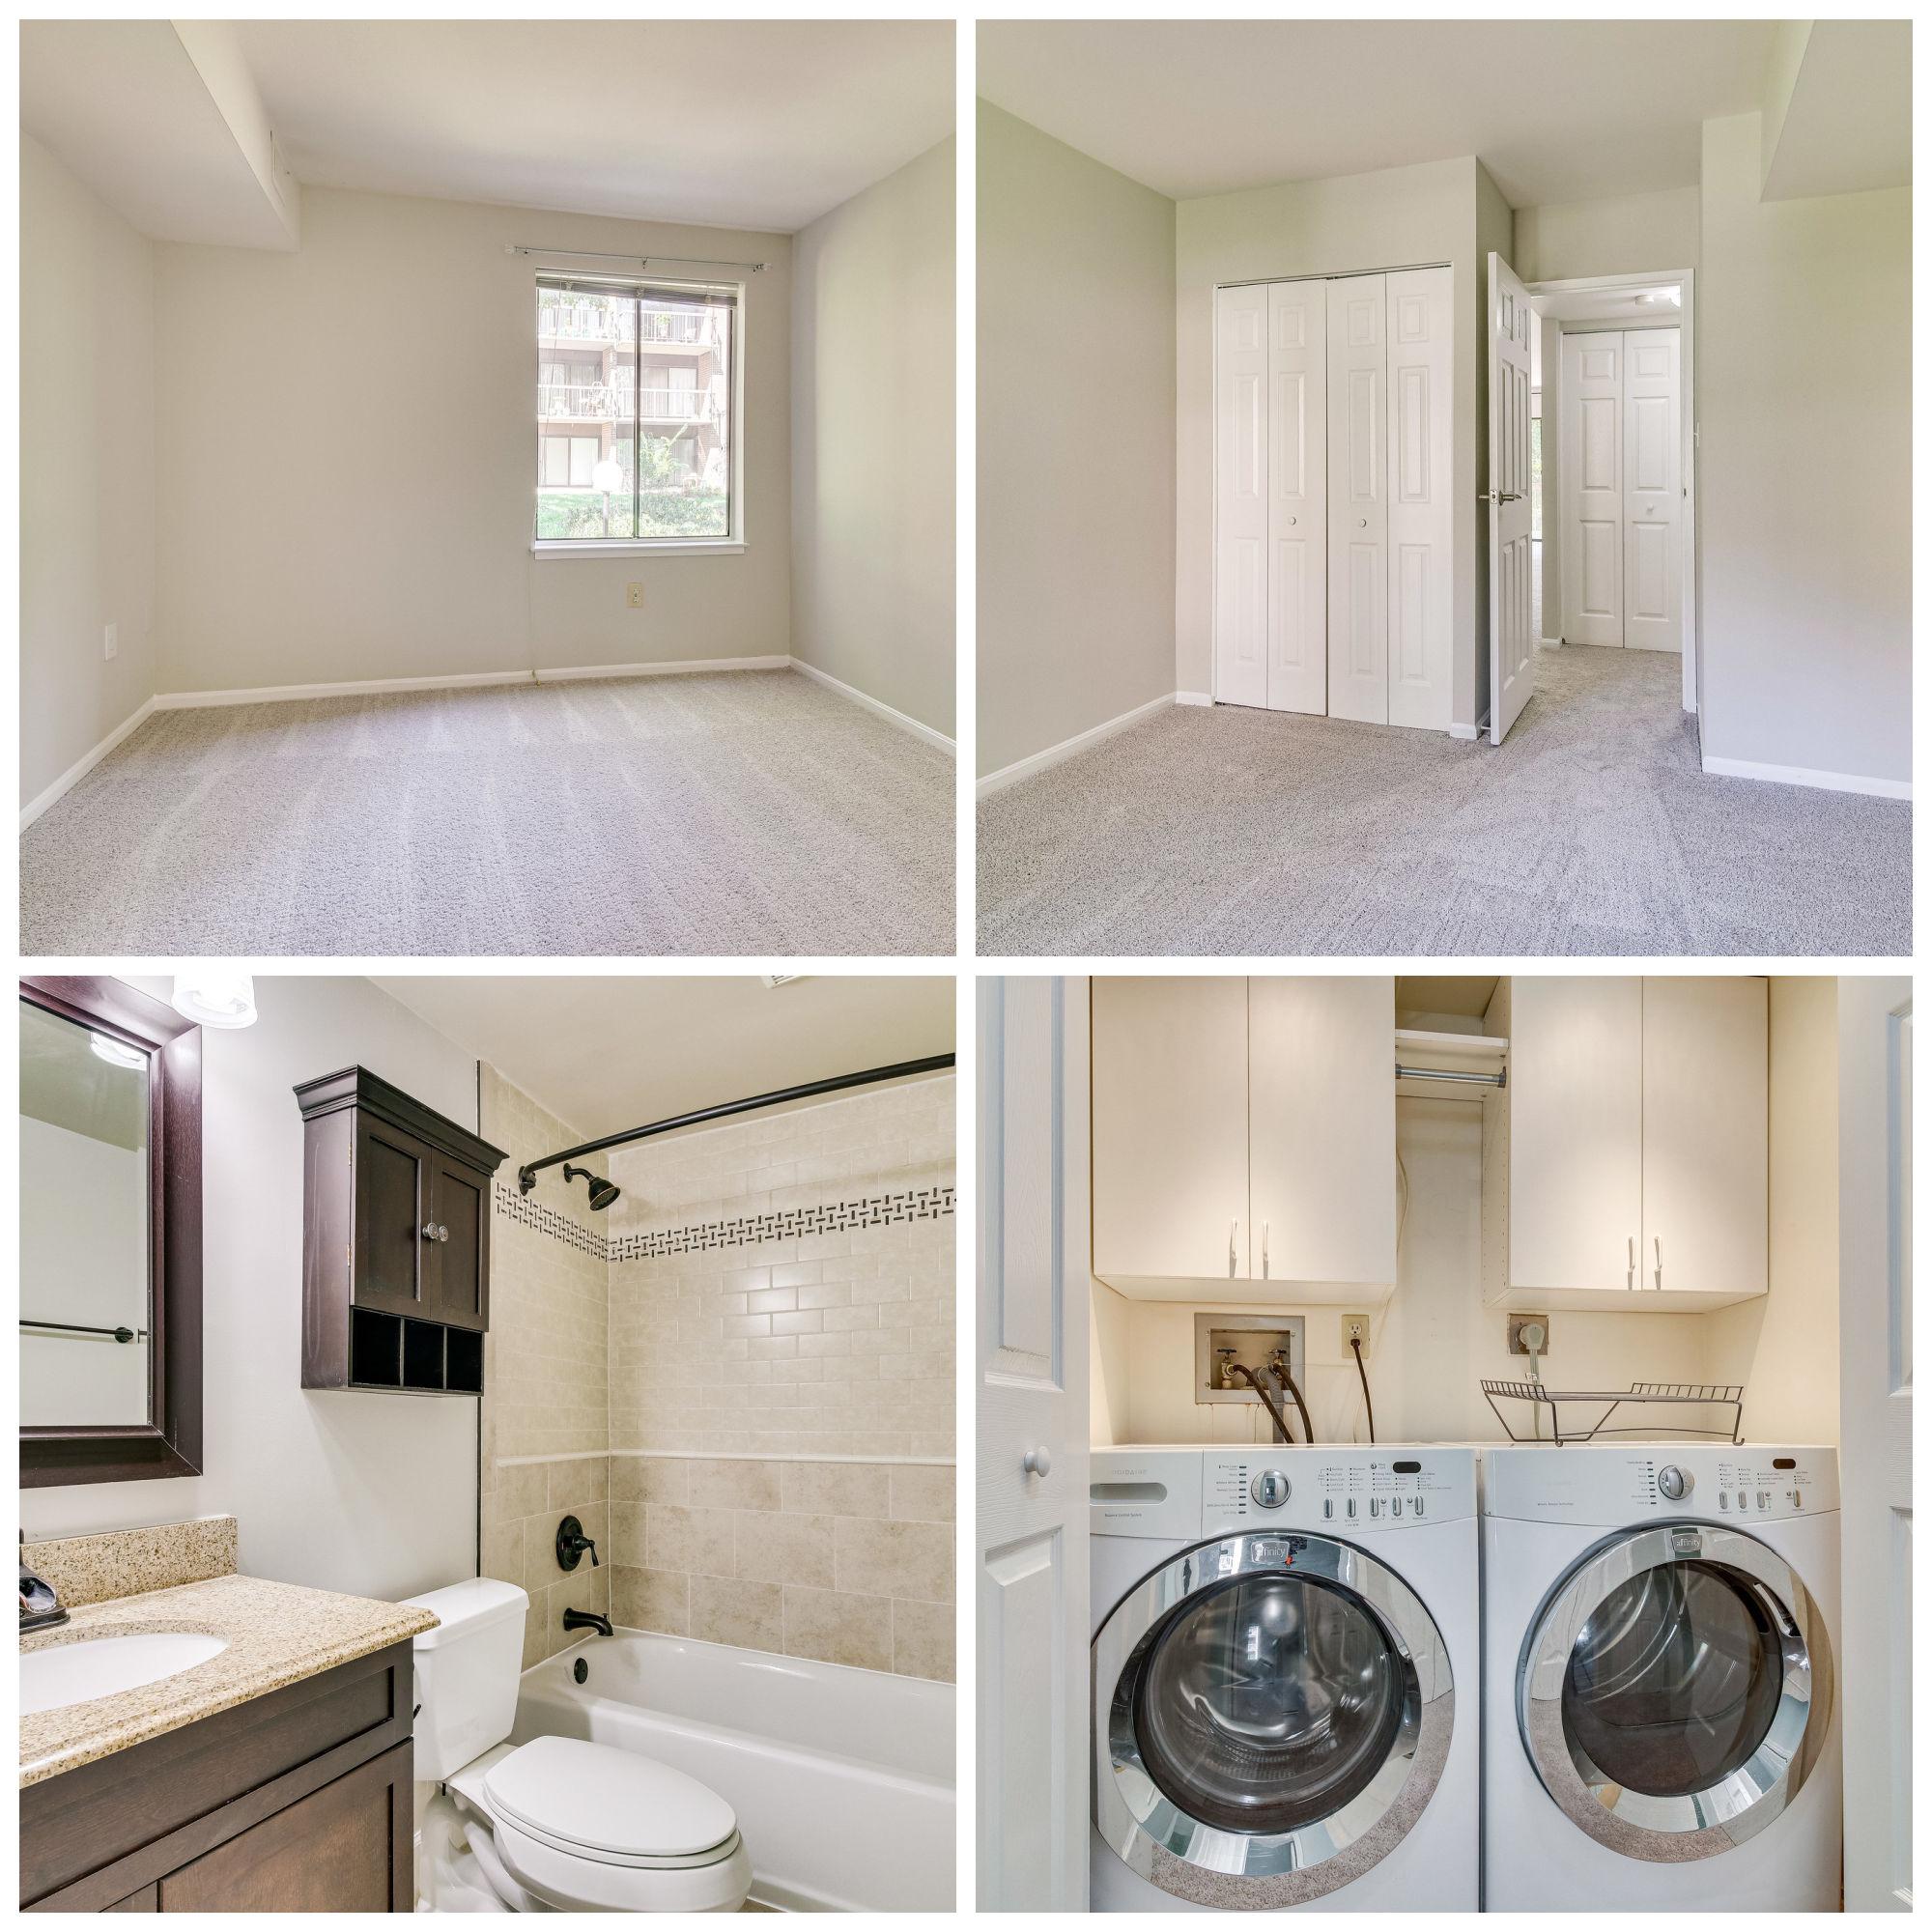 9810 Kingsbridge Dr #102, Fairfax- Secondary Bedroom, Bathroom, and Laundry